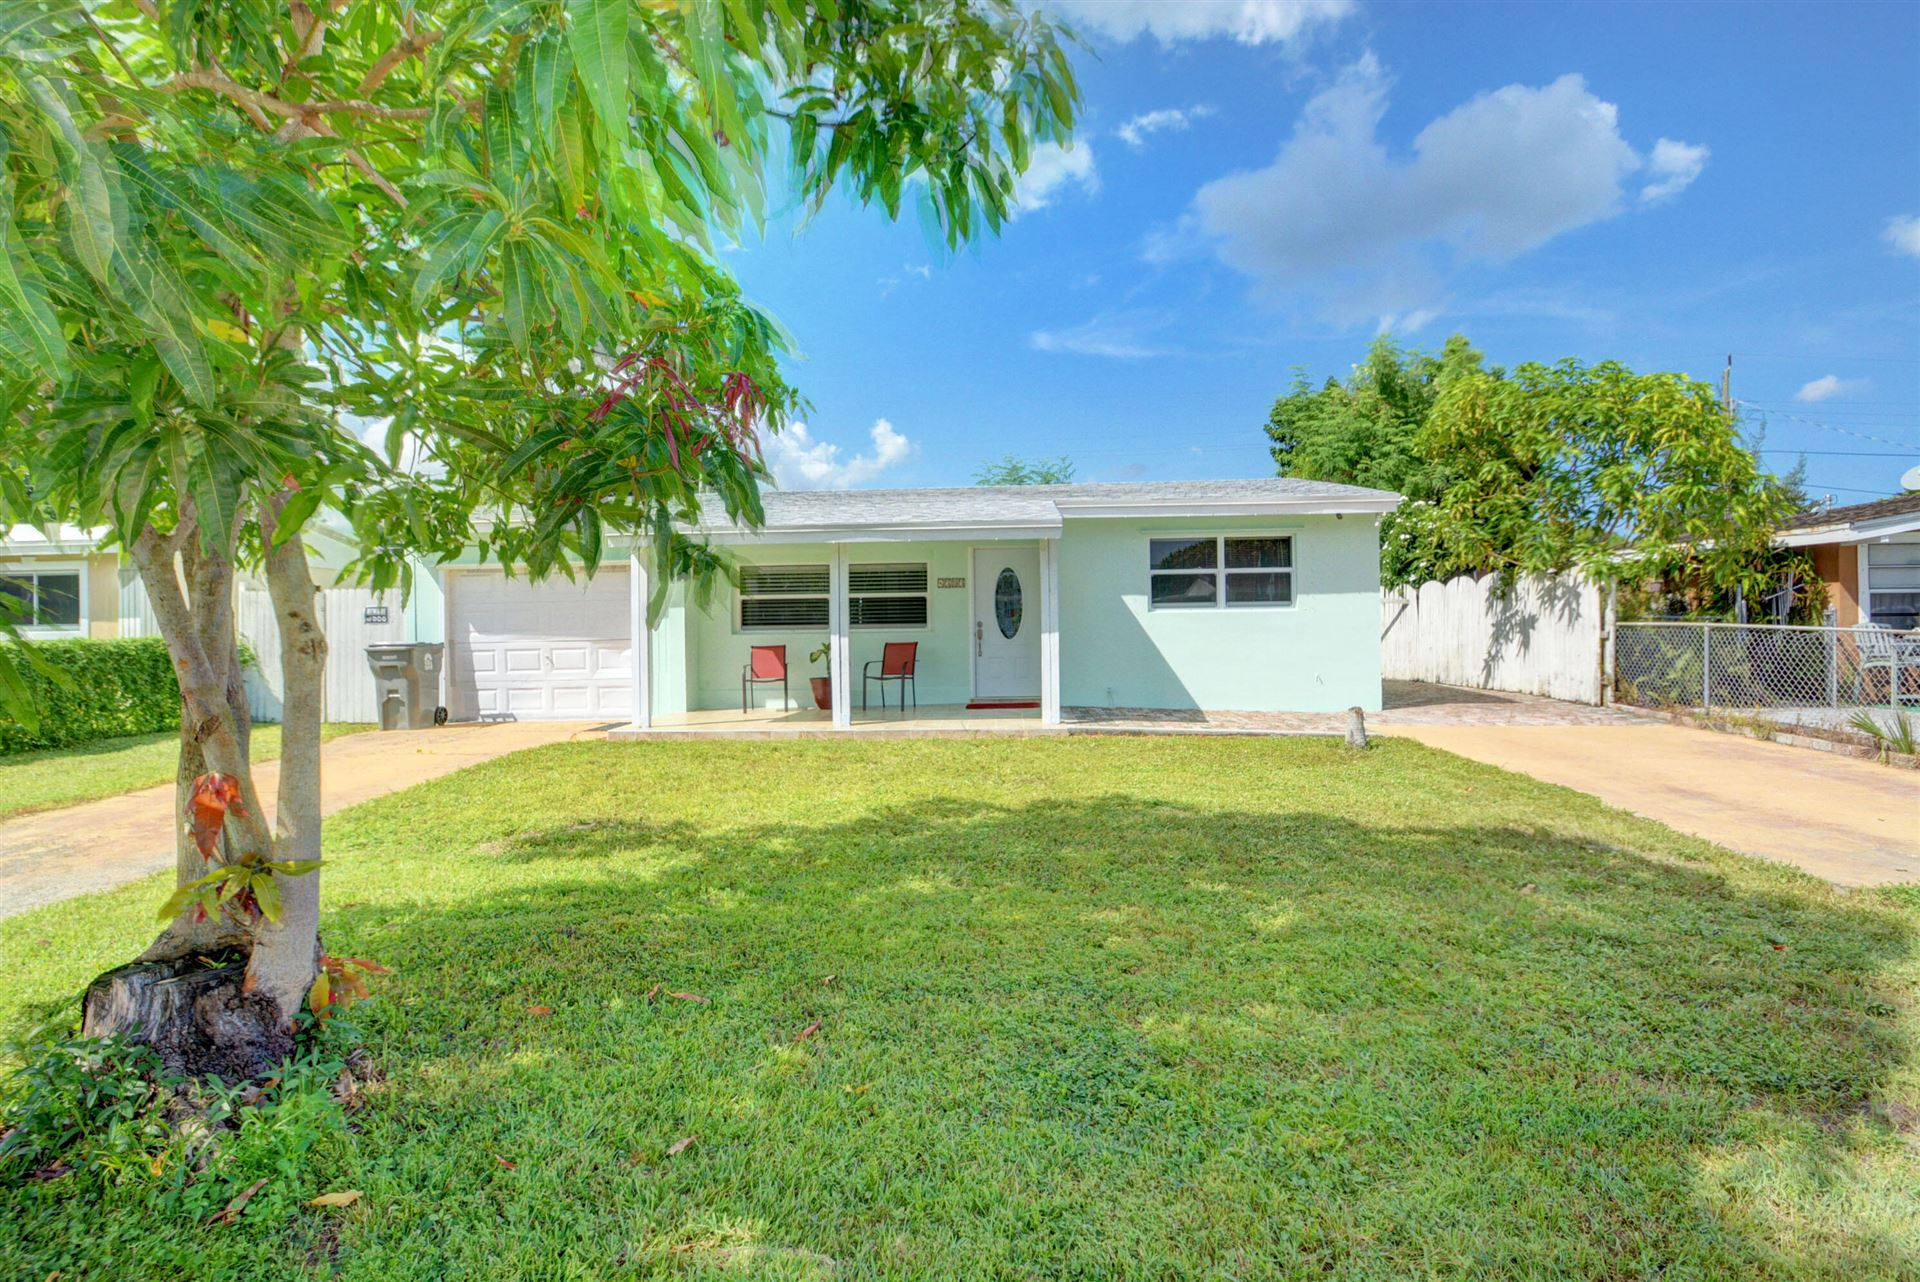 4303 Garand Lane, West Palm Beach, FL 33406 - MLS#: RX-10745639